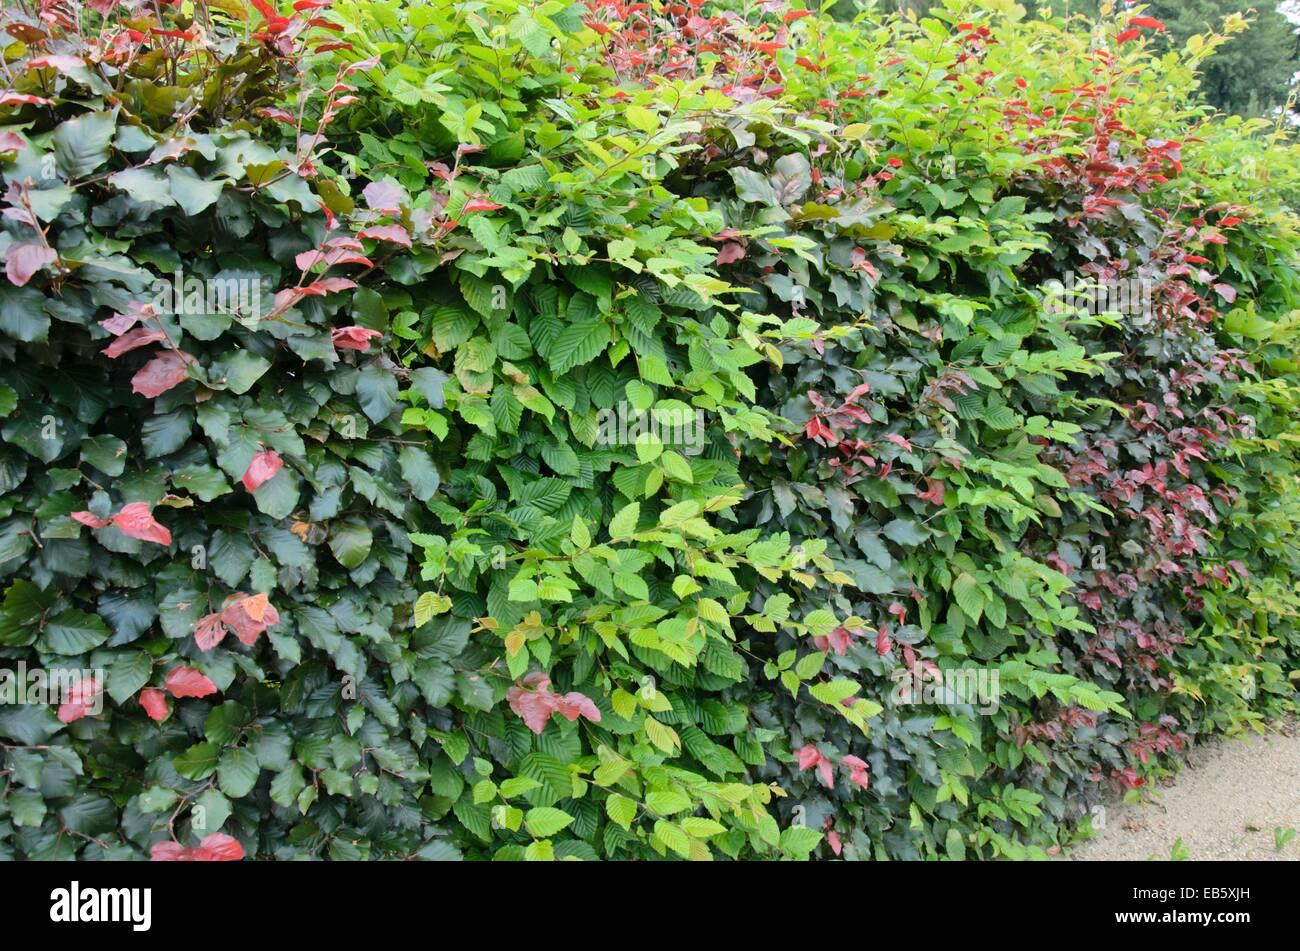 Common hornbeam (Carpinus betulus) and copper beech (Fagus sylvatica 'Purpurea') - Stock Image